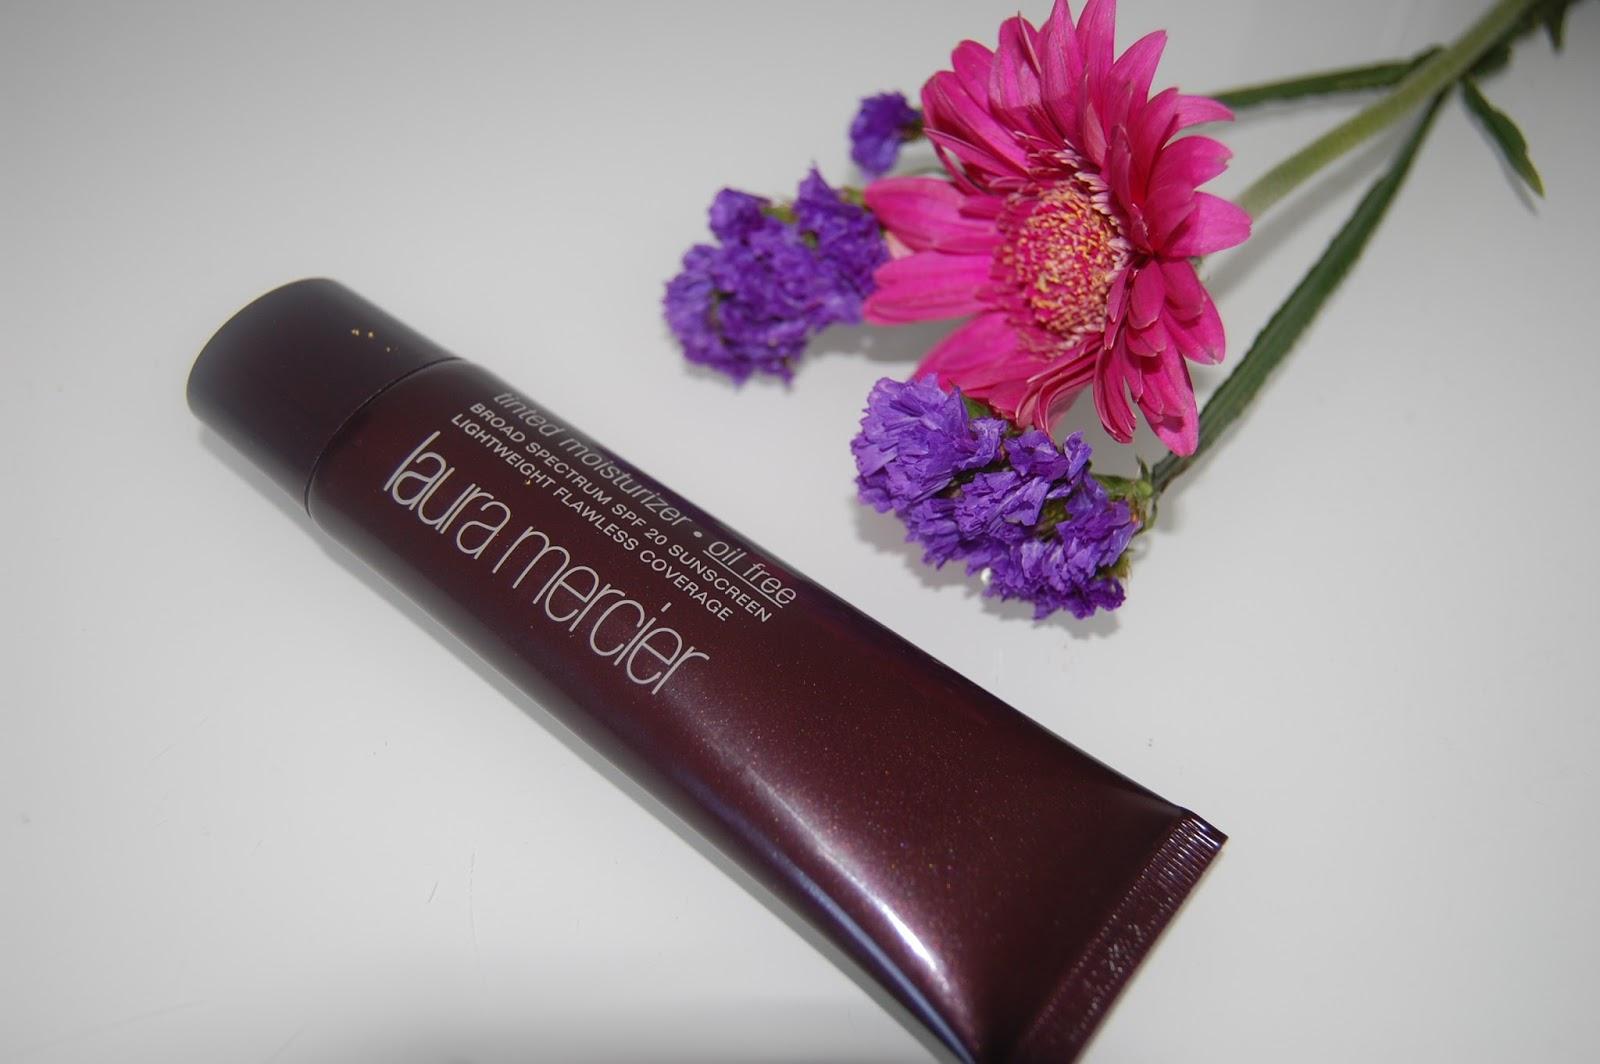 Beauty box laura mercier tinted moisturiser review for Laura mercier new york